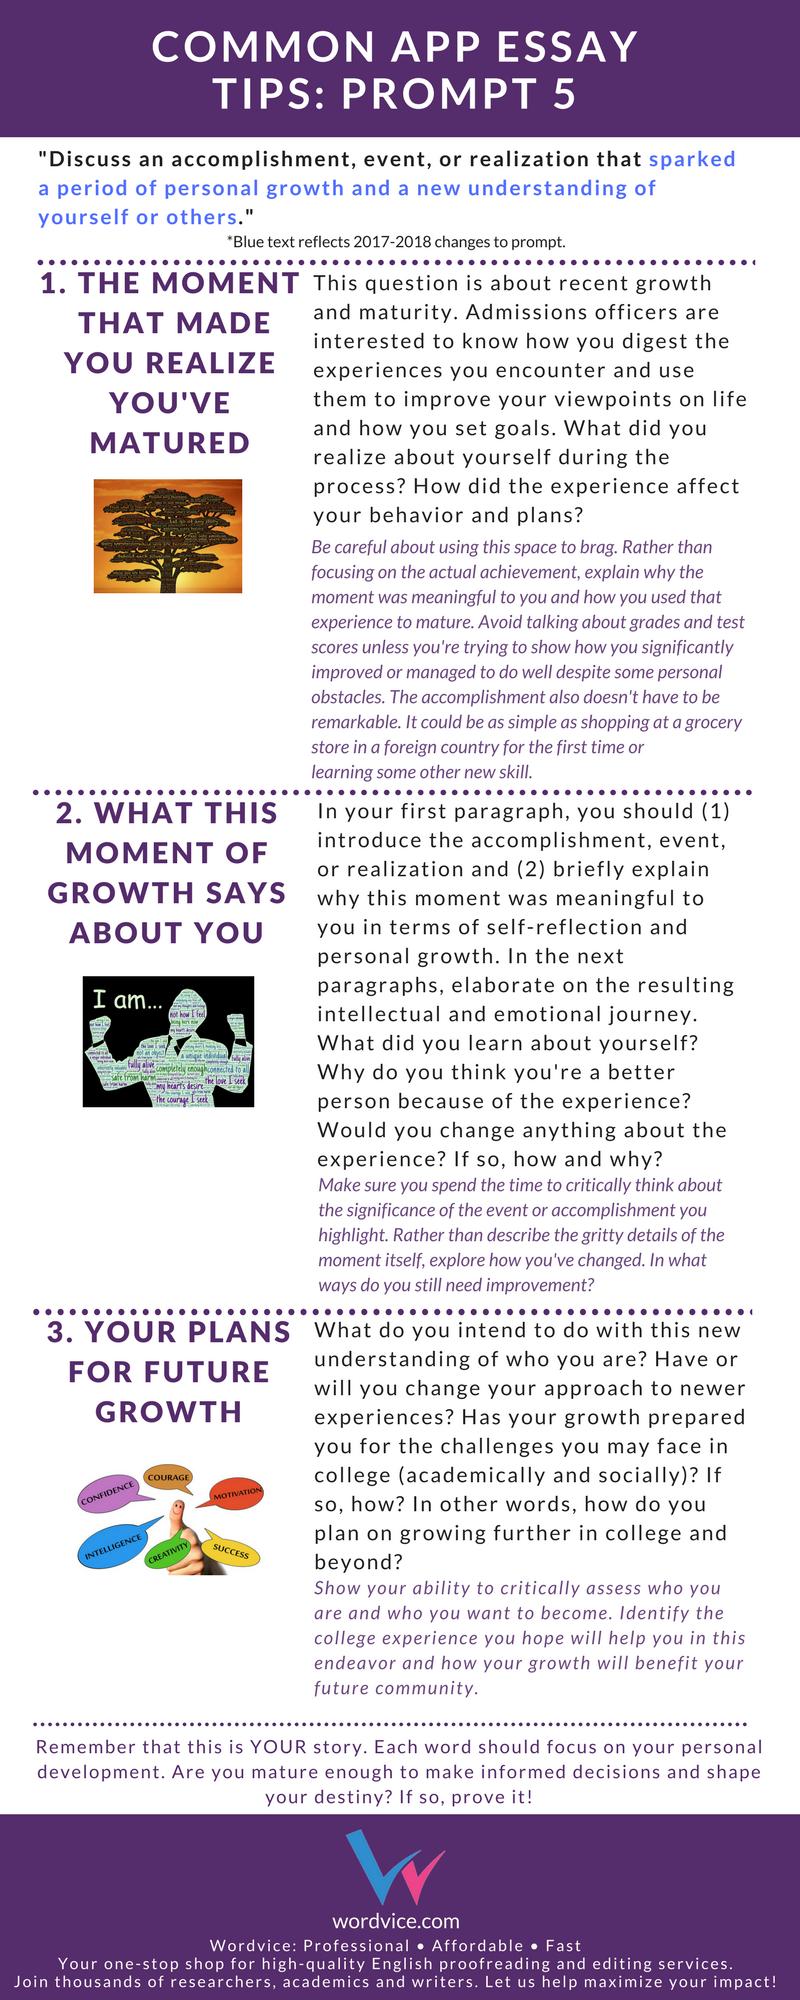 004 Essay Example Common App Help Brainstormprompt Surprising Examples 2018 That Worked Full